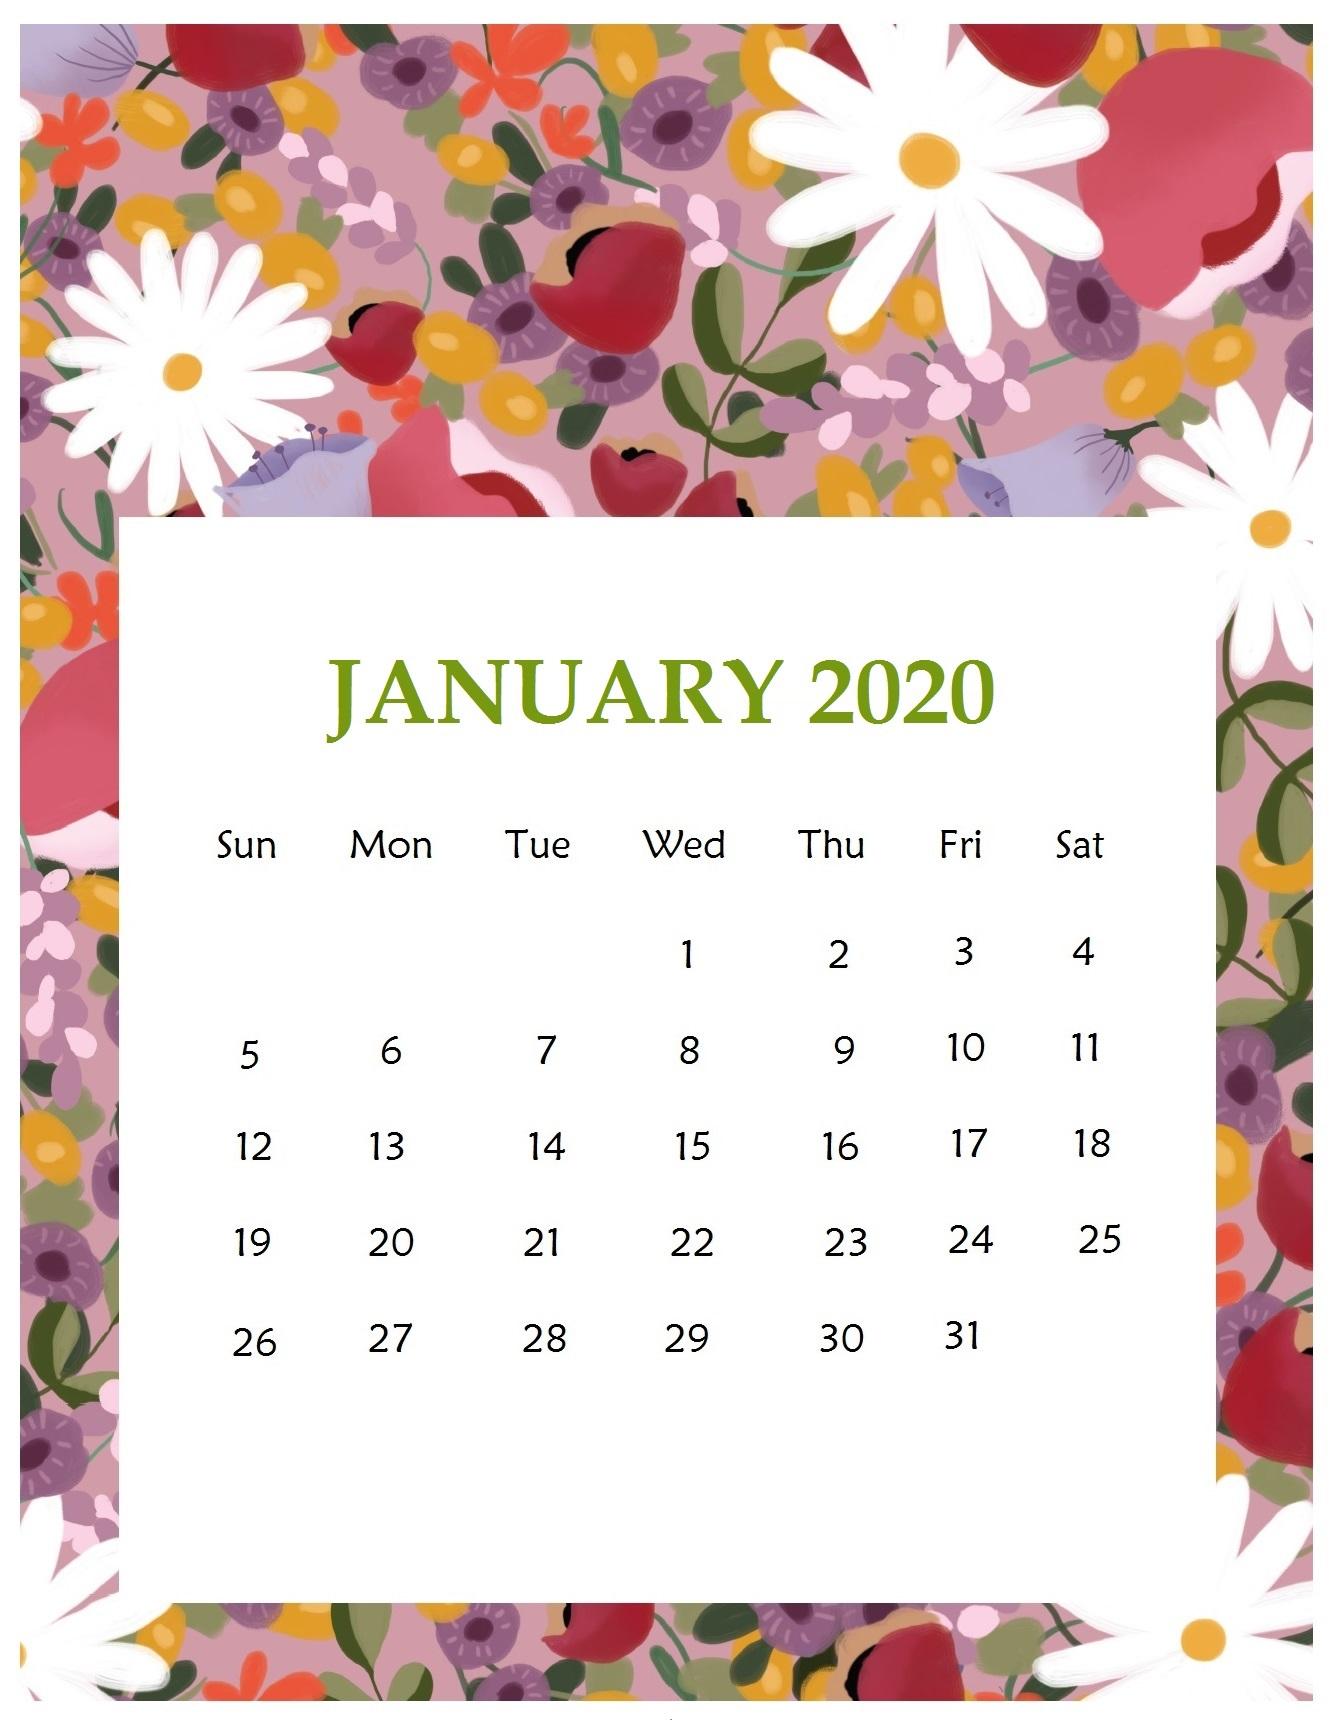 Best January 2020 Calendar Designs Latest Calendar 1338x1730